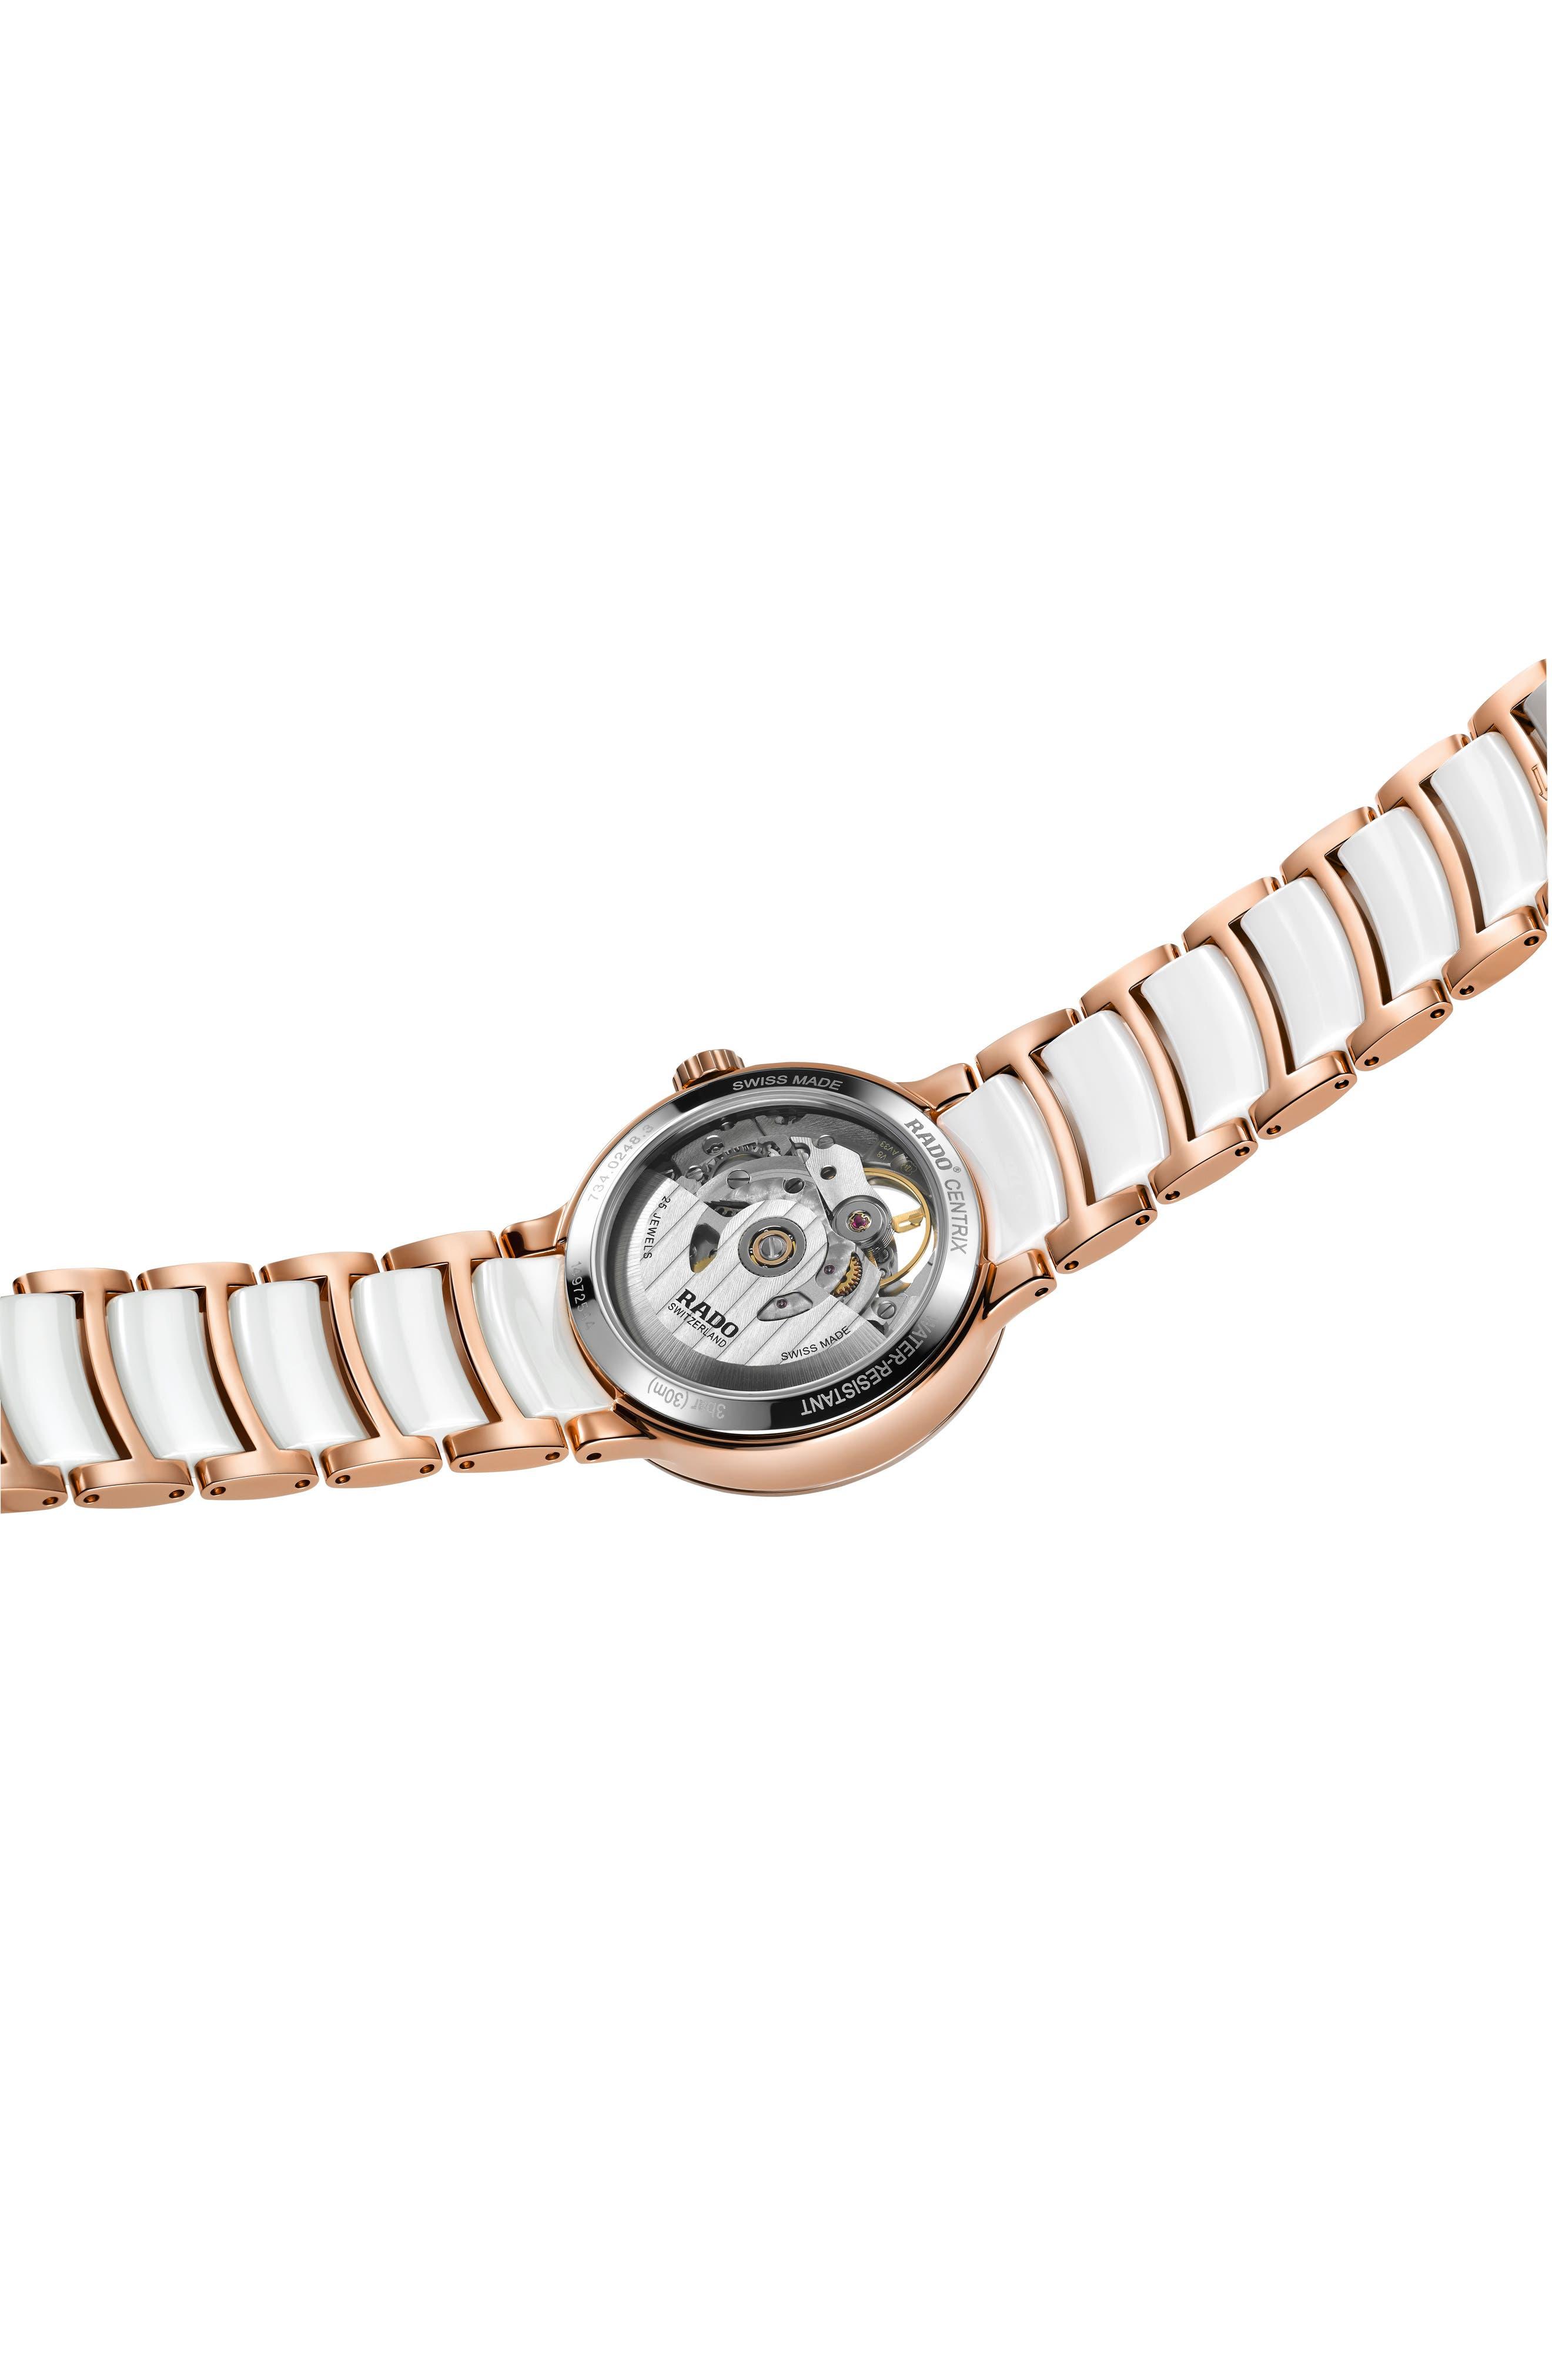 Centrix Open Heart Automatic Diamond Ceramic Bracelet Watch, 33mm,                             Alternate thumbnail 2, color,                             White/ Mop/ Rose Gold